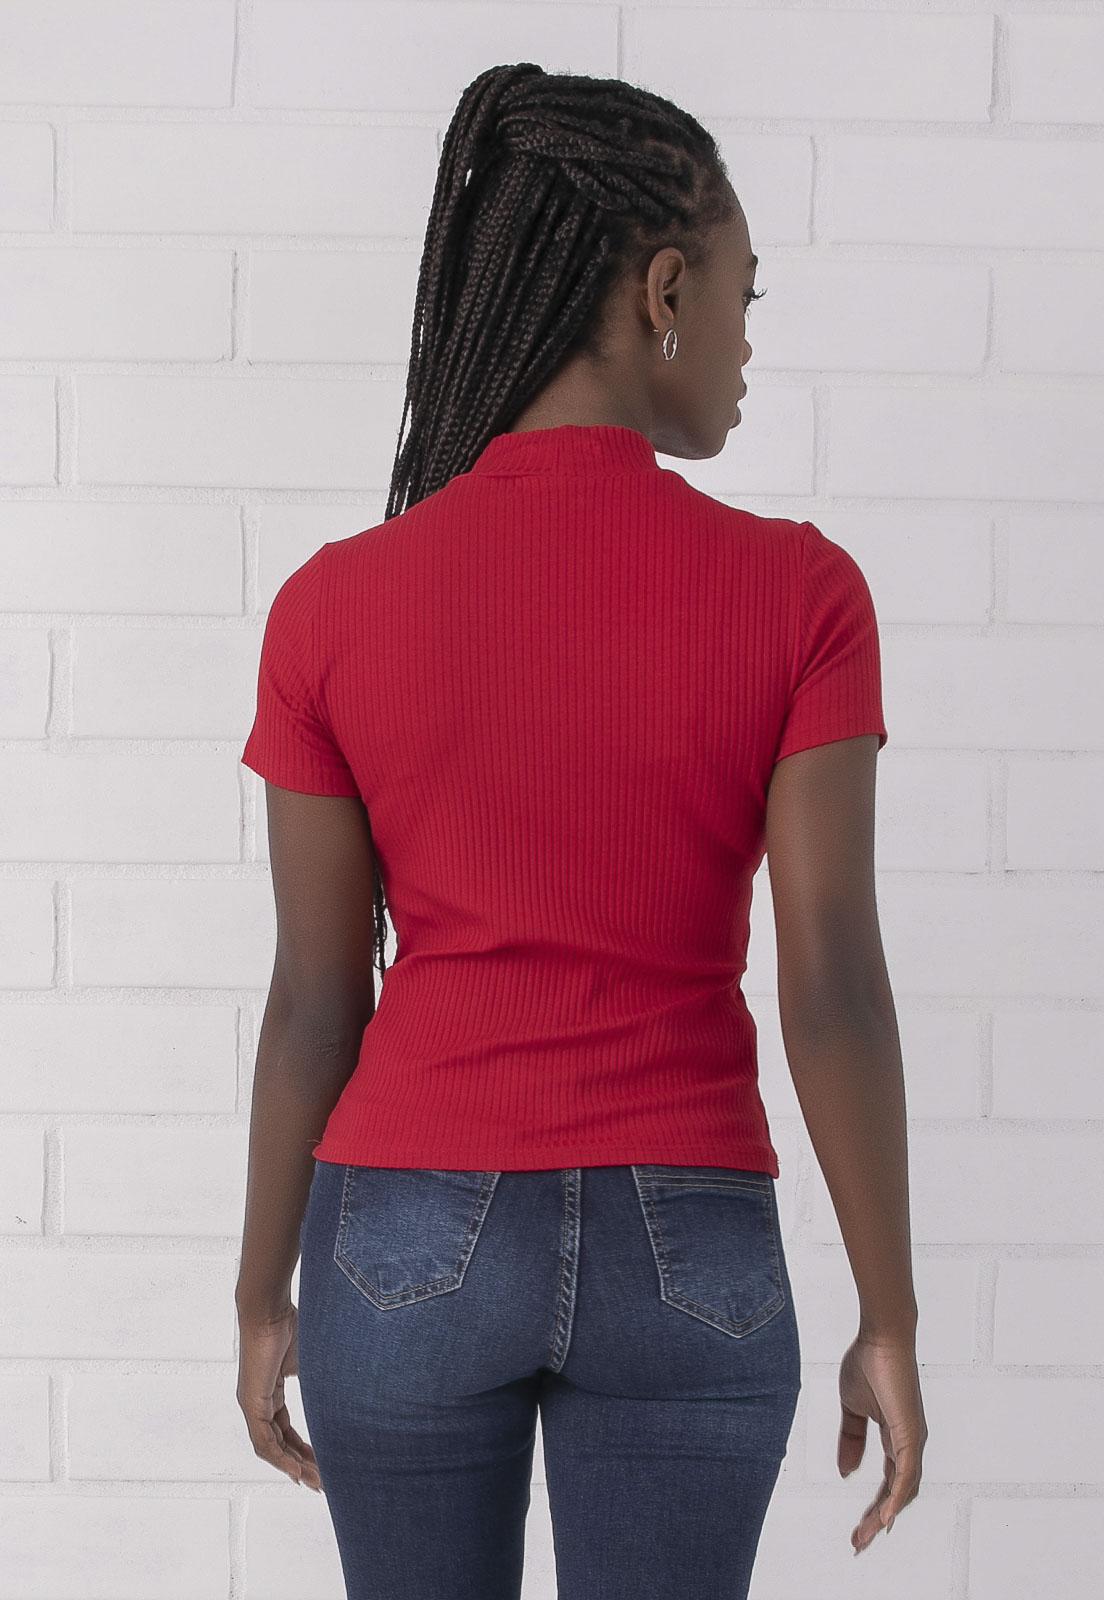 Blusa Manga Curta Com Gola Vermelha PKD